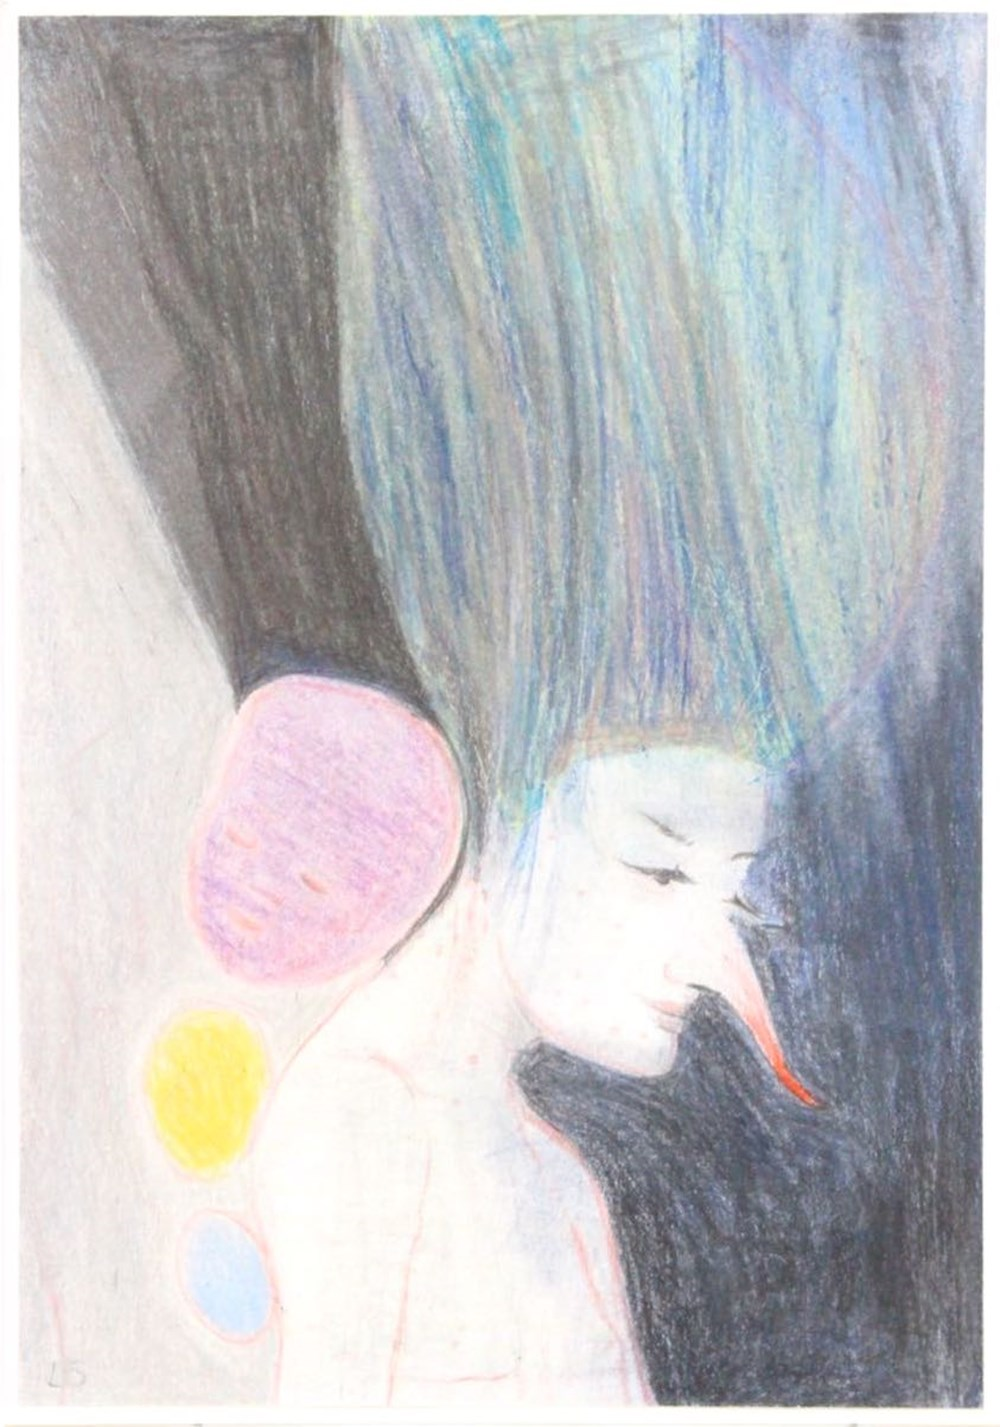 Life on Venus II | The Human, Timed Auction - Lot 34, Lucy Spanyol, Venus Genetrix